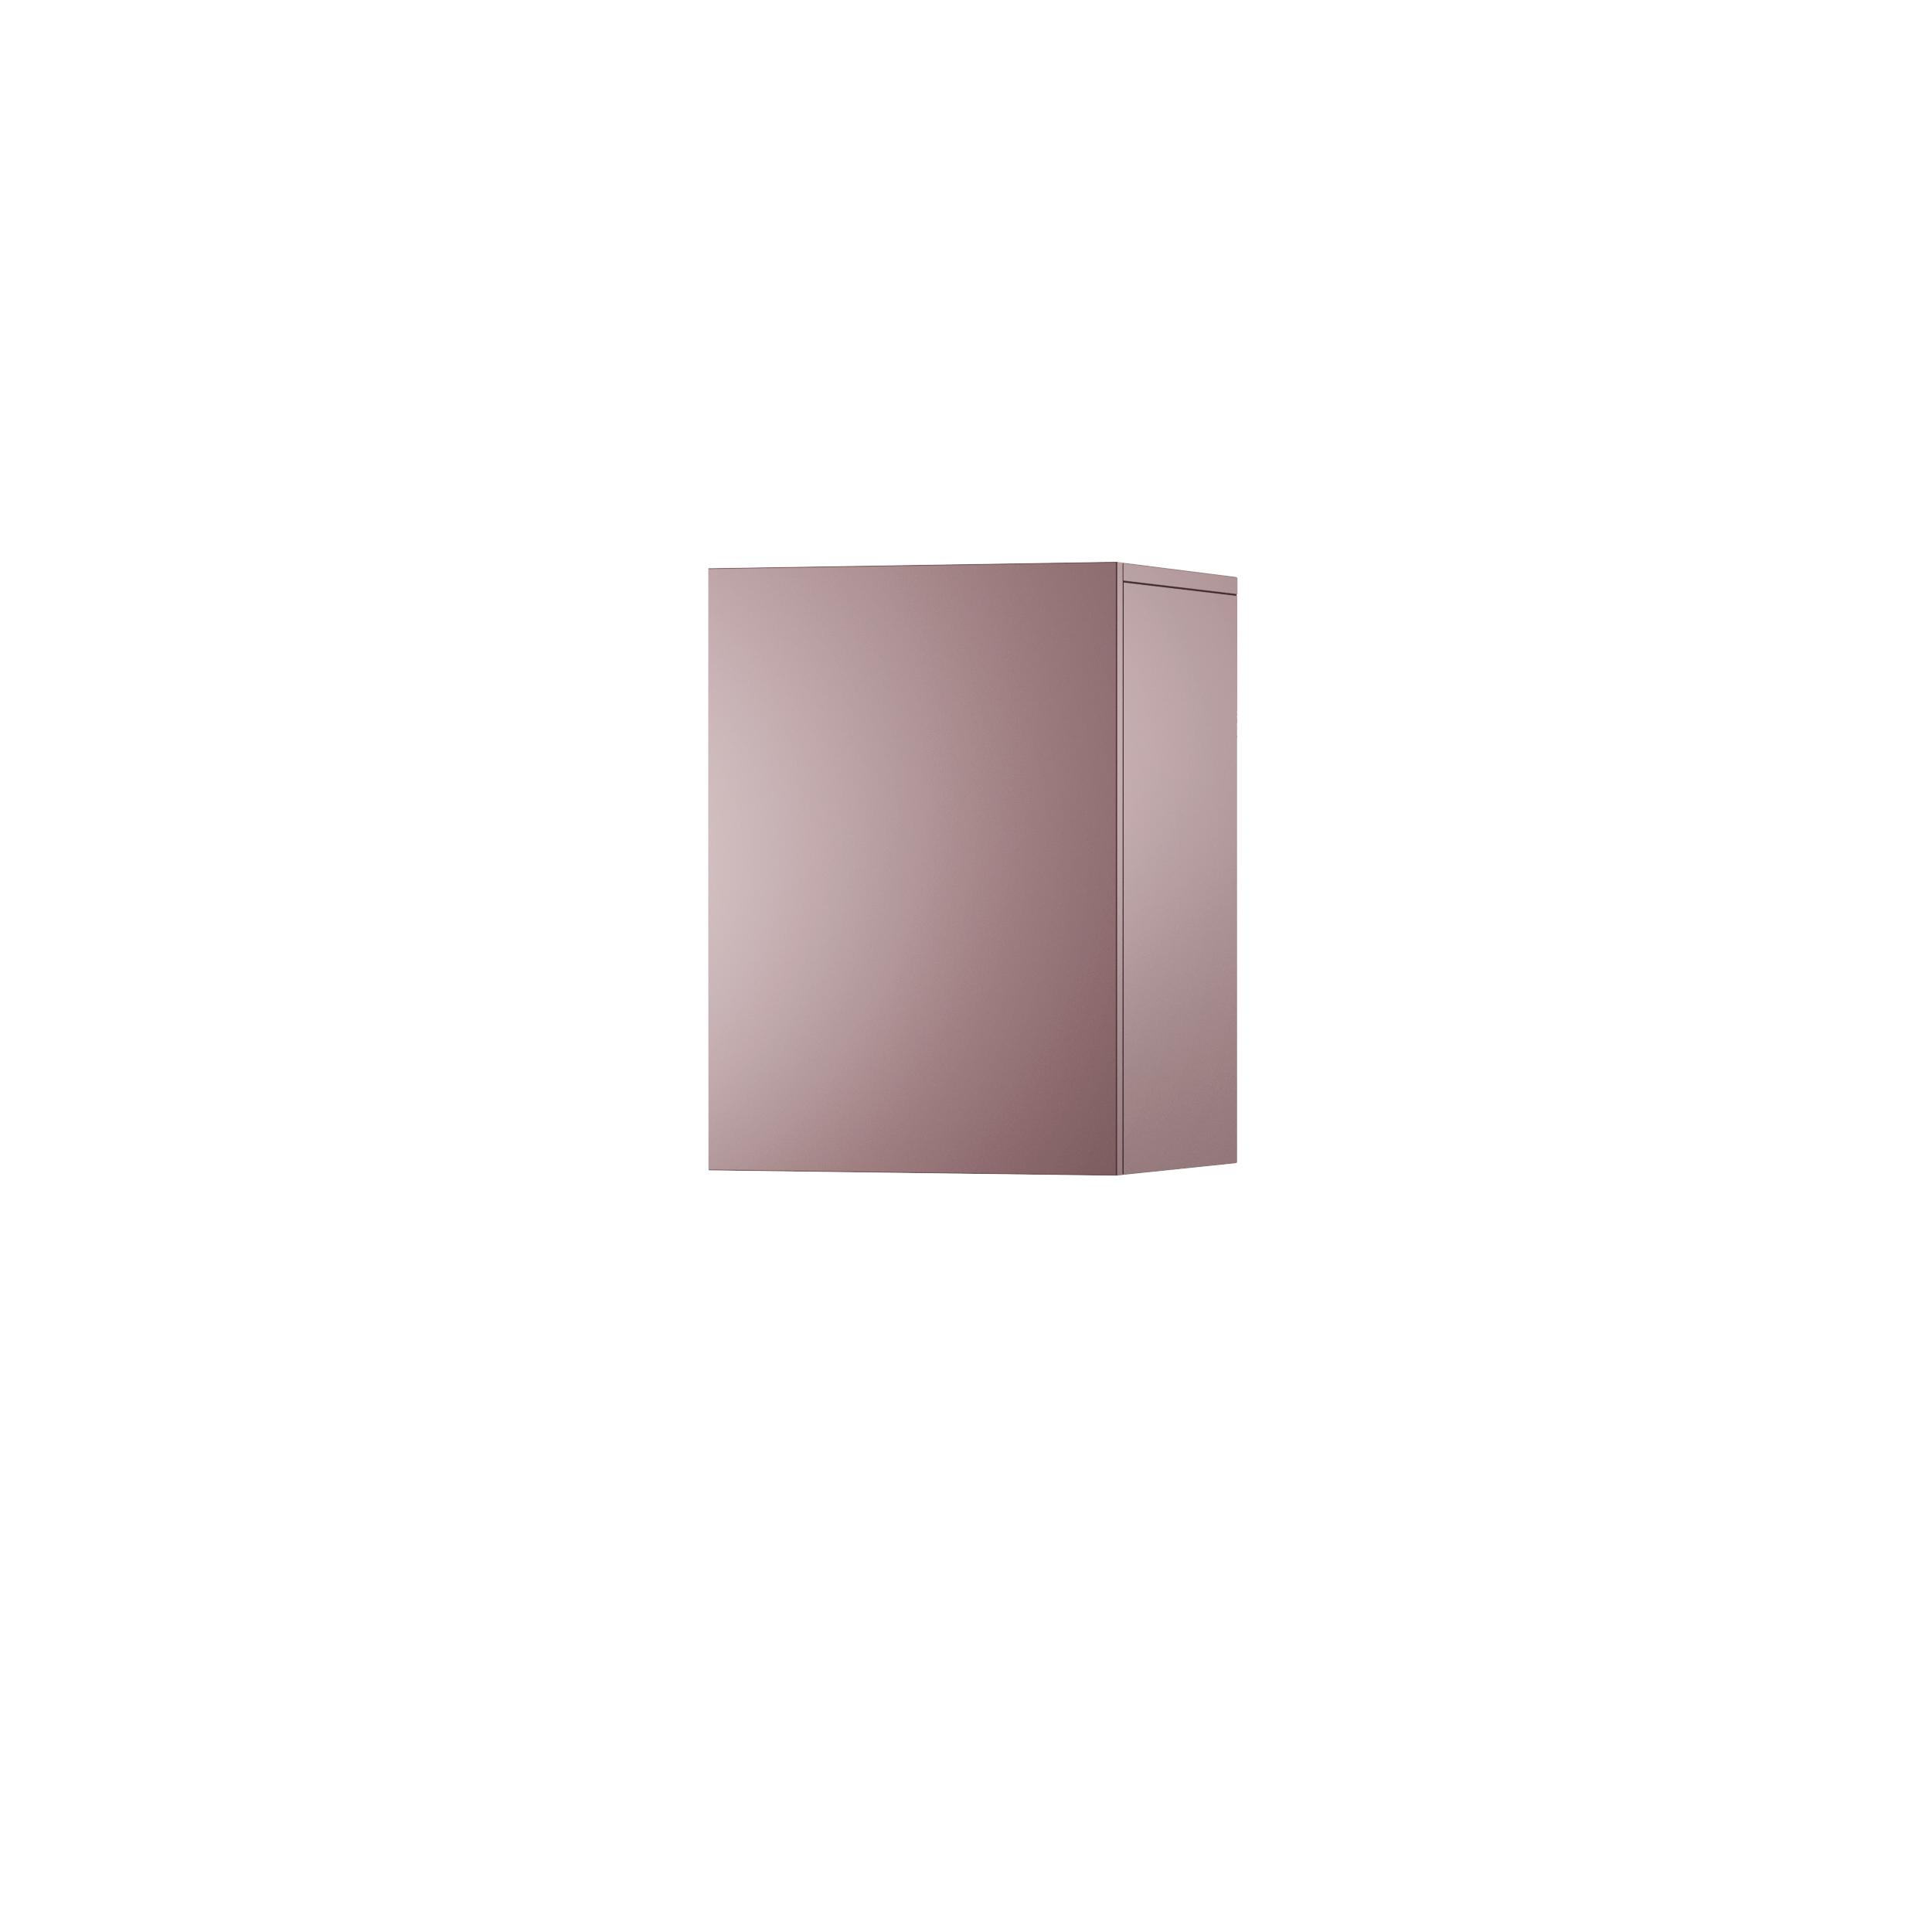 Dulap modular Nook Narrow Violet, L42xl37xh58 cm